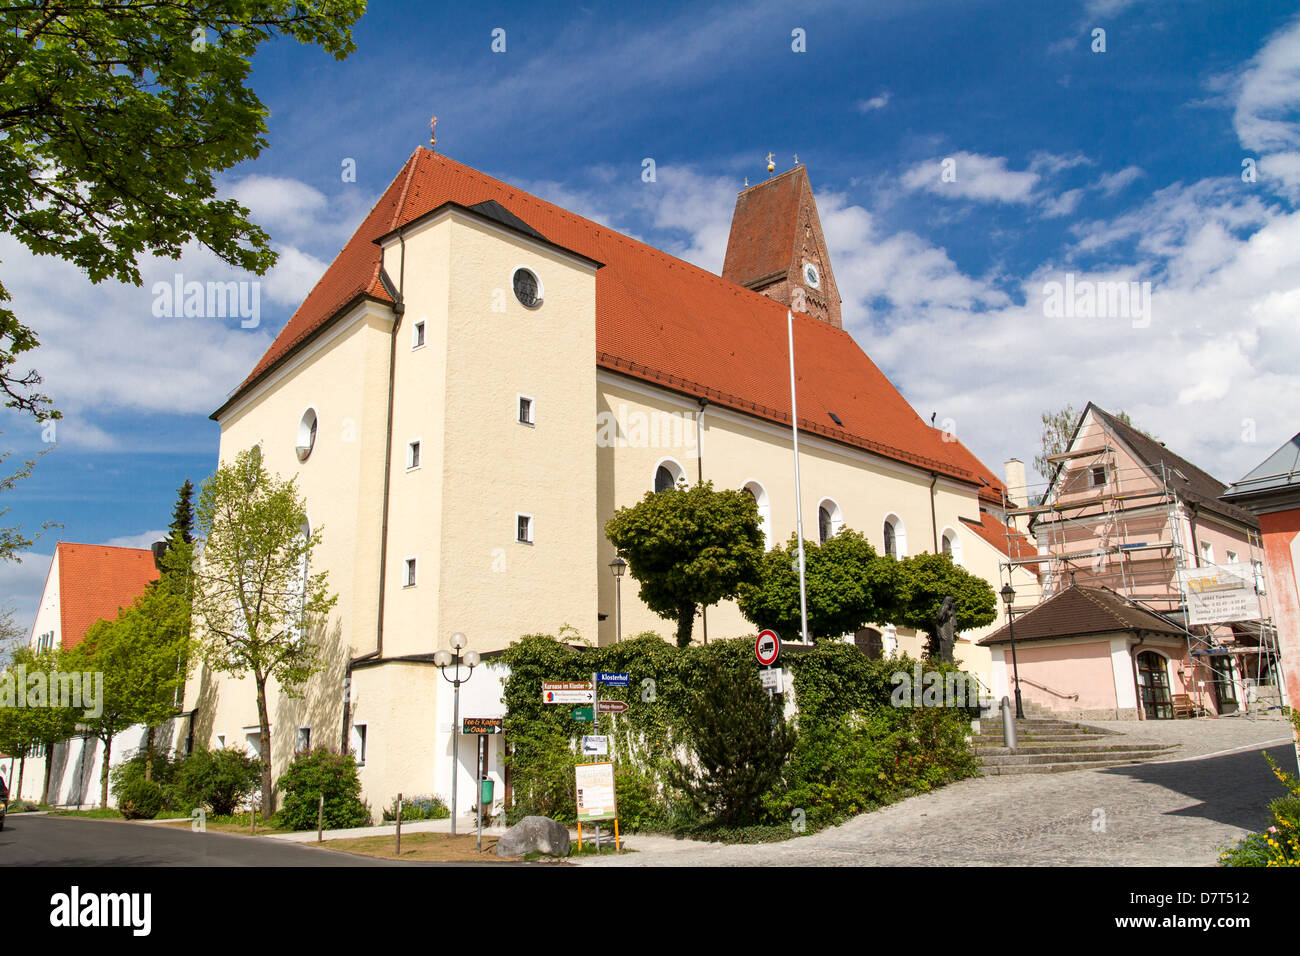 Church in Bad Woerishofen, Germany Stock Photo